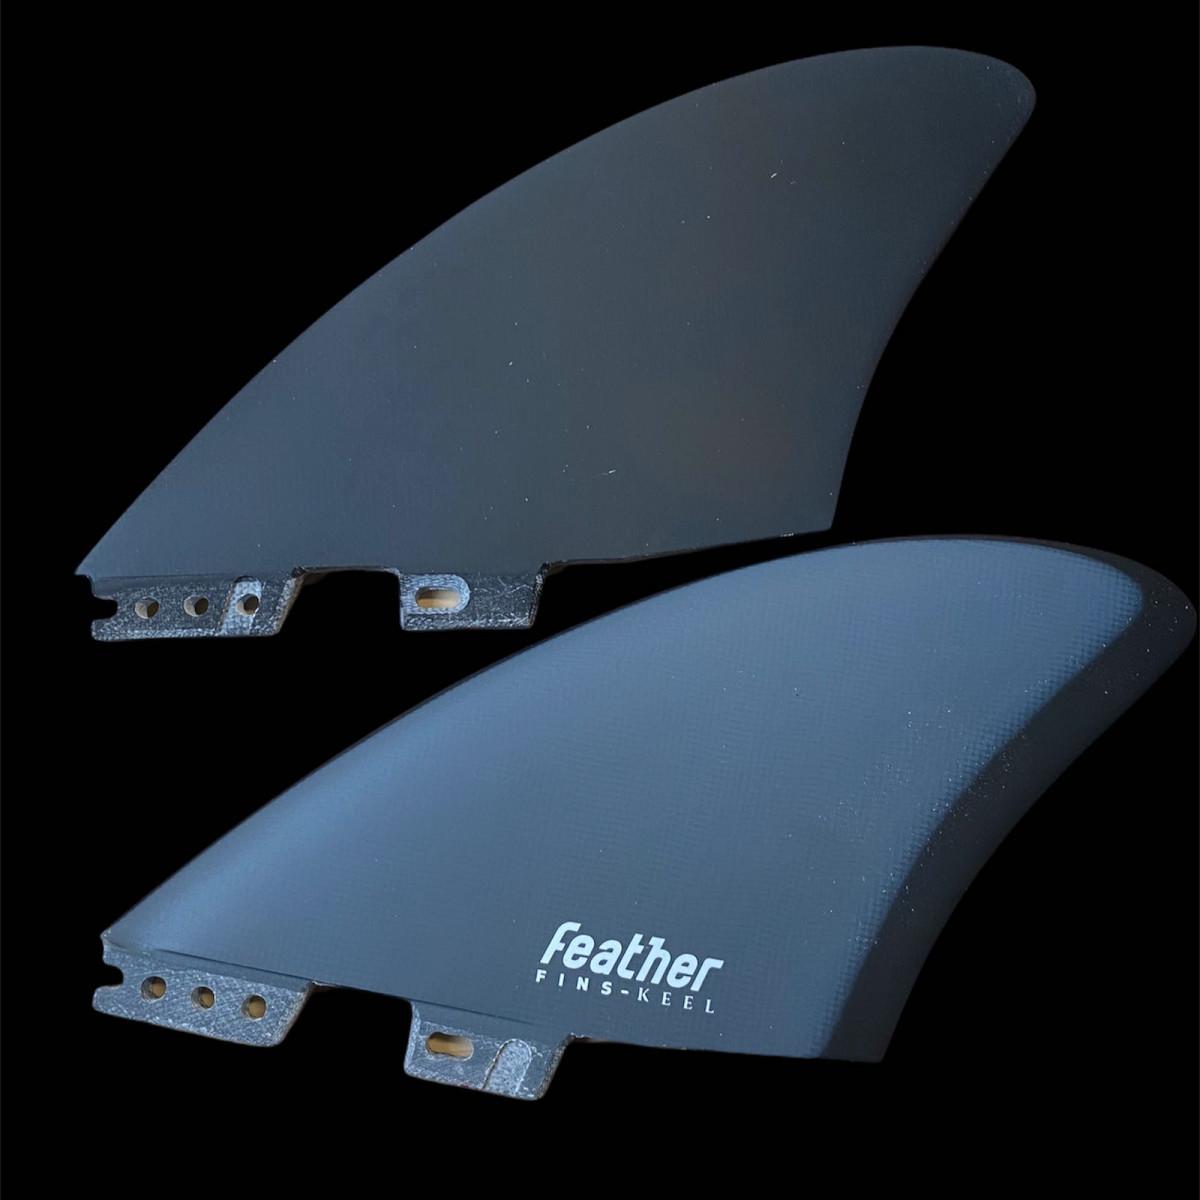 Twin keel Featherfins click tab